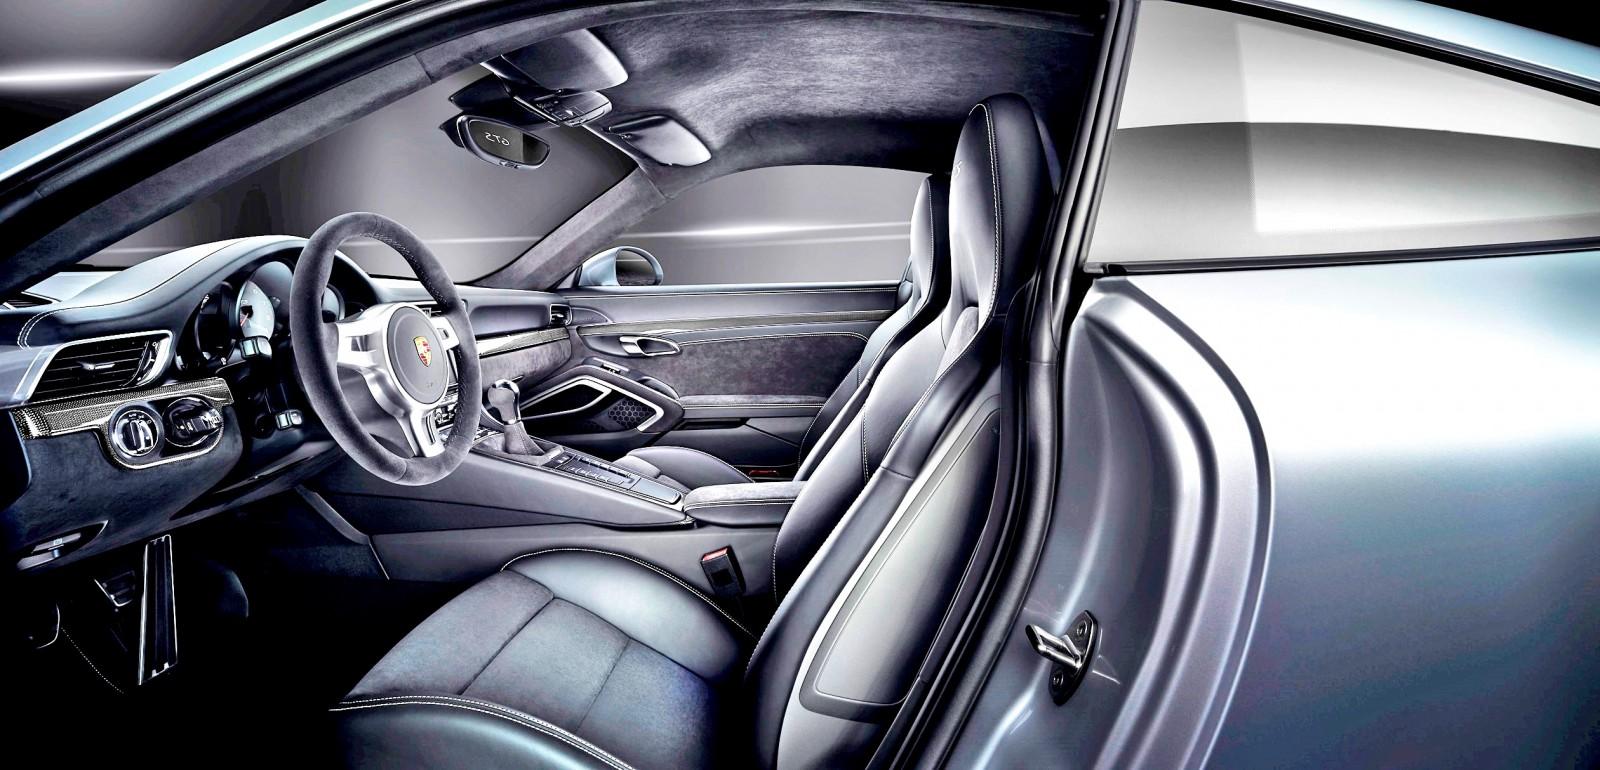 2015 Porsche 911 GTS 4